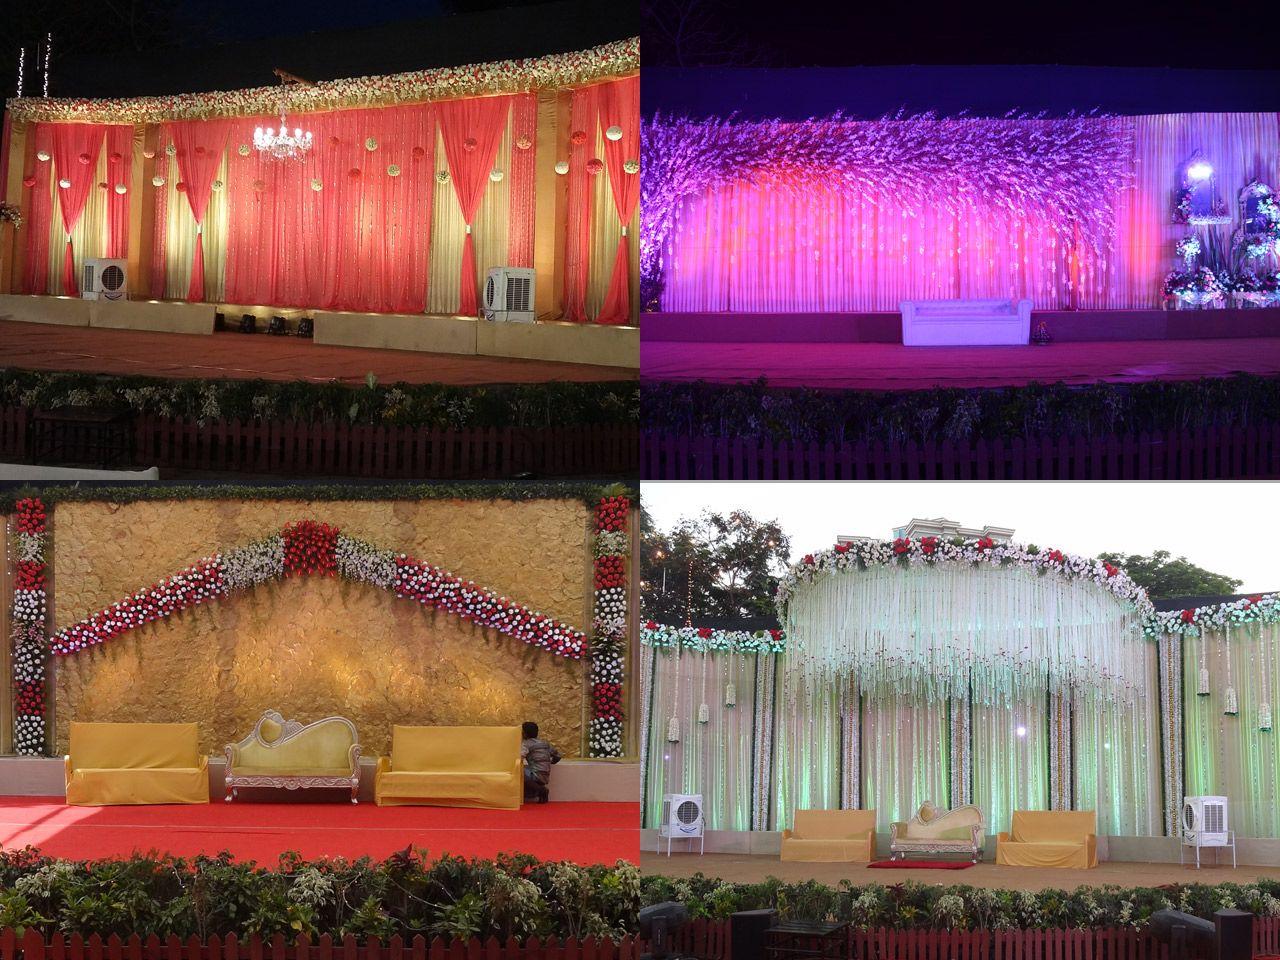 Mumbai Indian Wedding Reception Decorators And Planners Goa Beach Wedding Planning And Mandap Stage Decoration Venue Mumbai Gujarat India